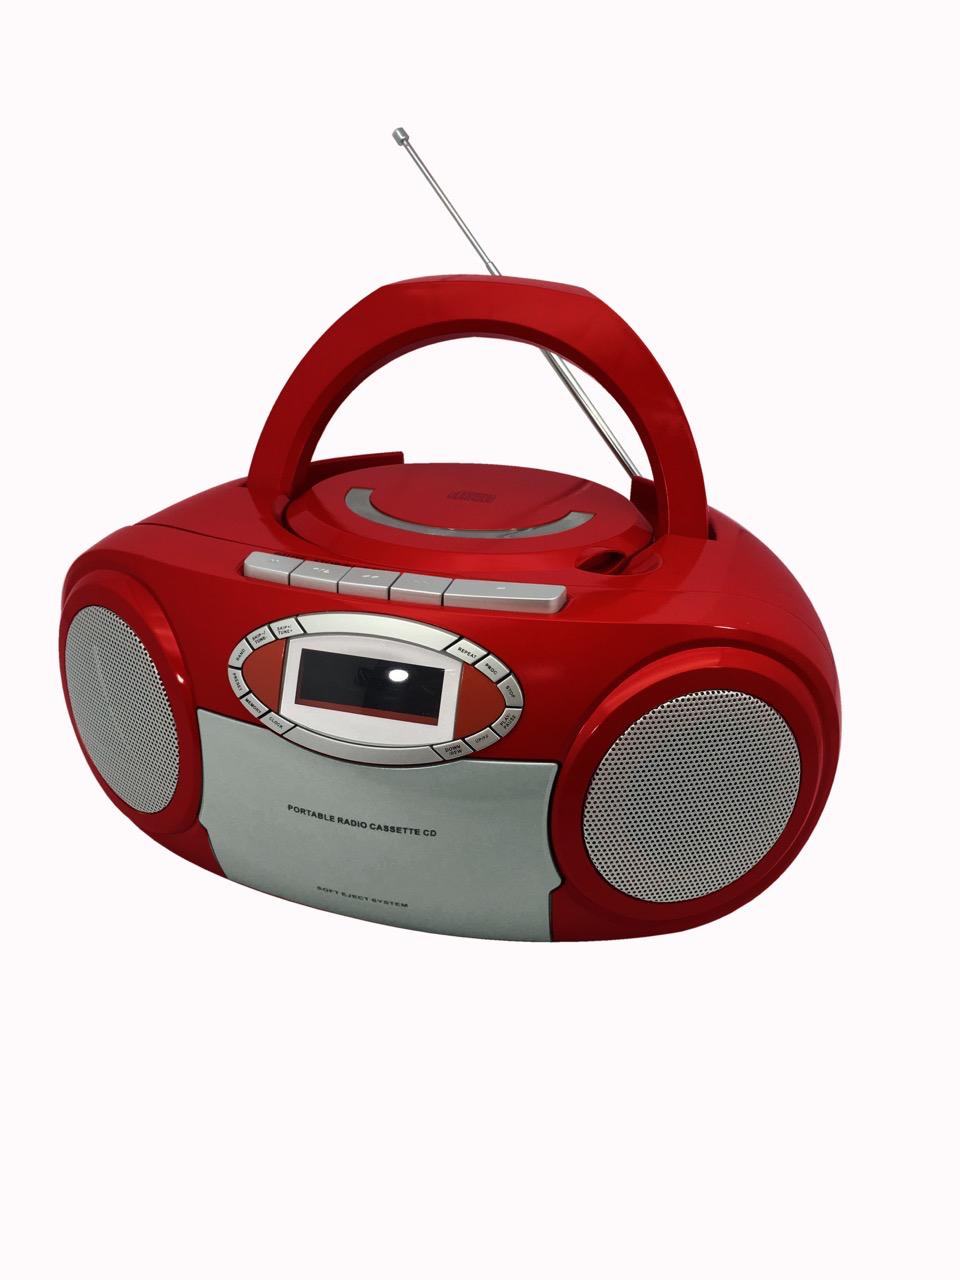 CT289 CD BOOMBOX CASSETTE (RED).jpg